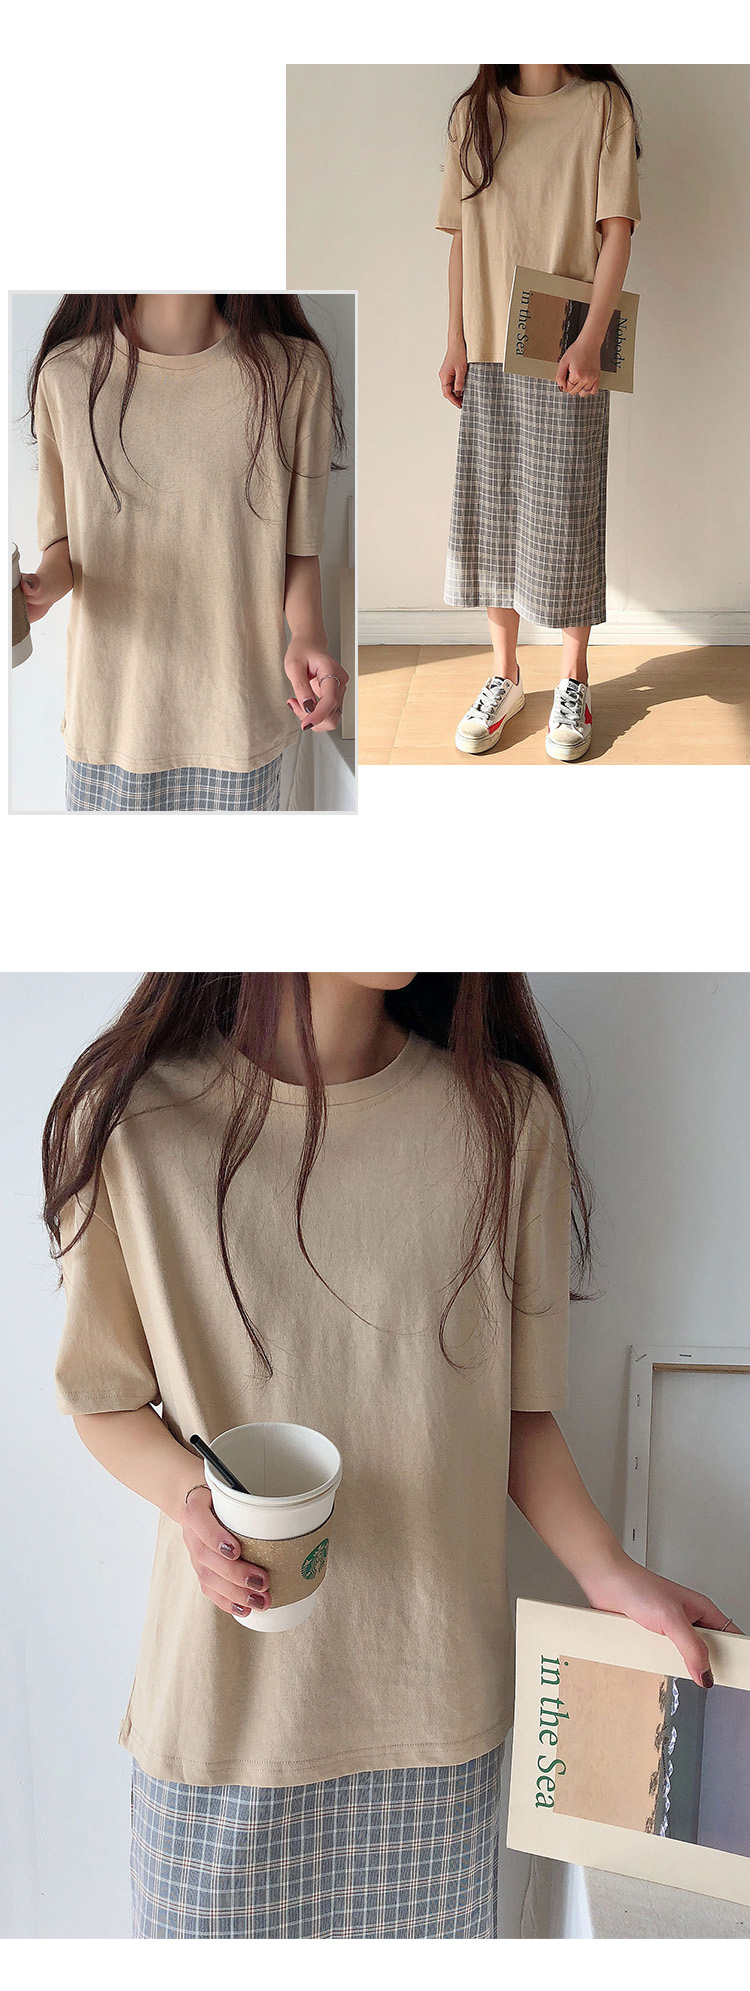 H1530d9153e094a7a8c4916237aa30b60Y - Summer O-Neck Short Sleeves Minimalist Loose Basic T-Shirt